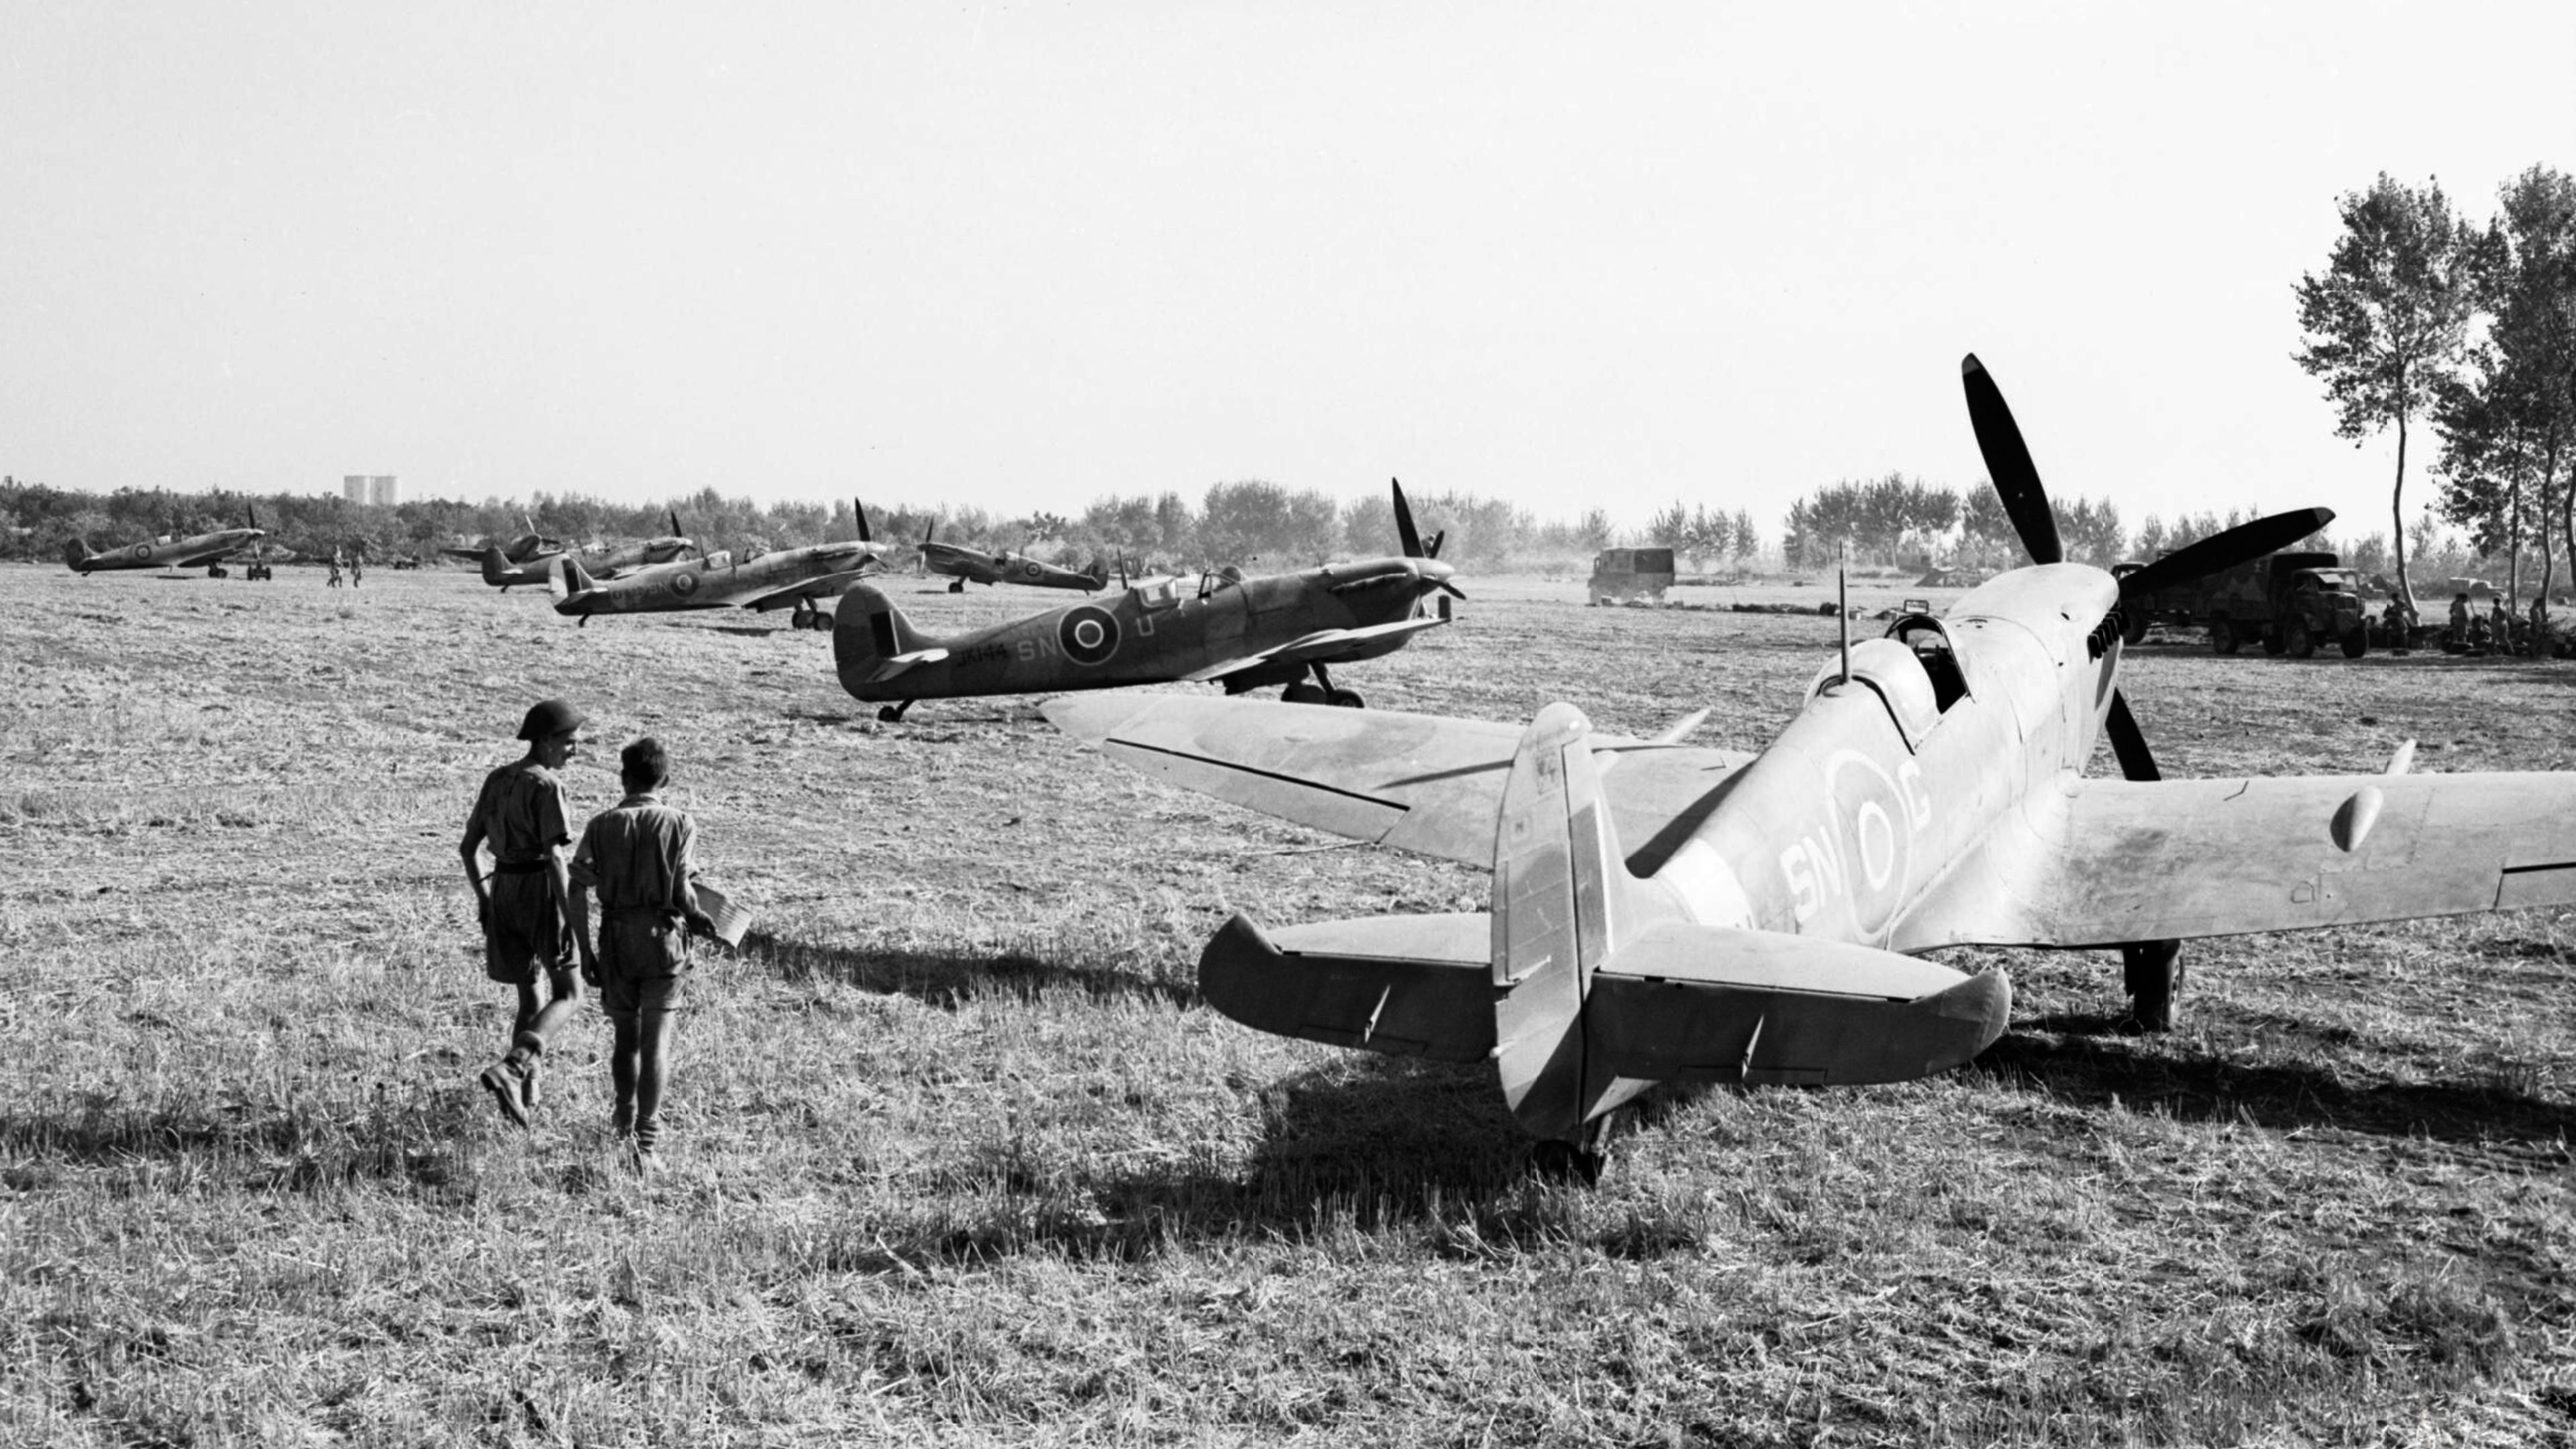 Spitfire Vc RAF 243Sqn SNG SNU at Tusciano landing ground Salerno IWM CNA1425a